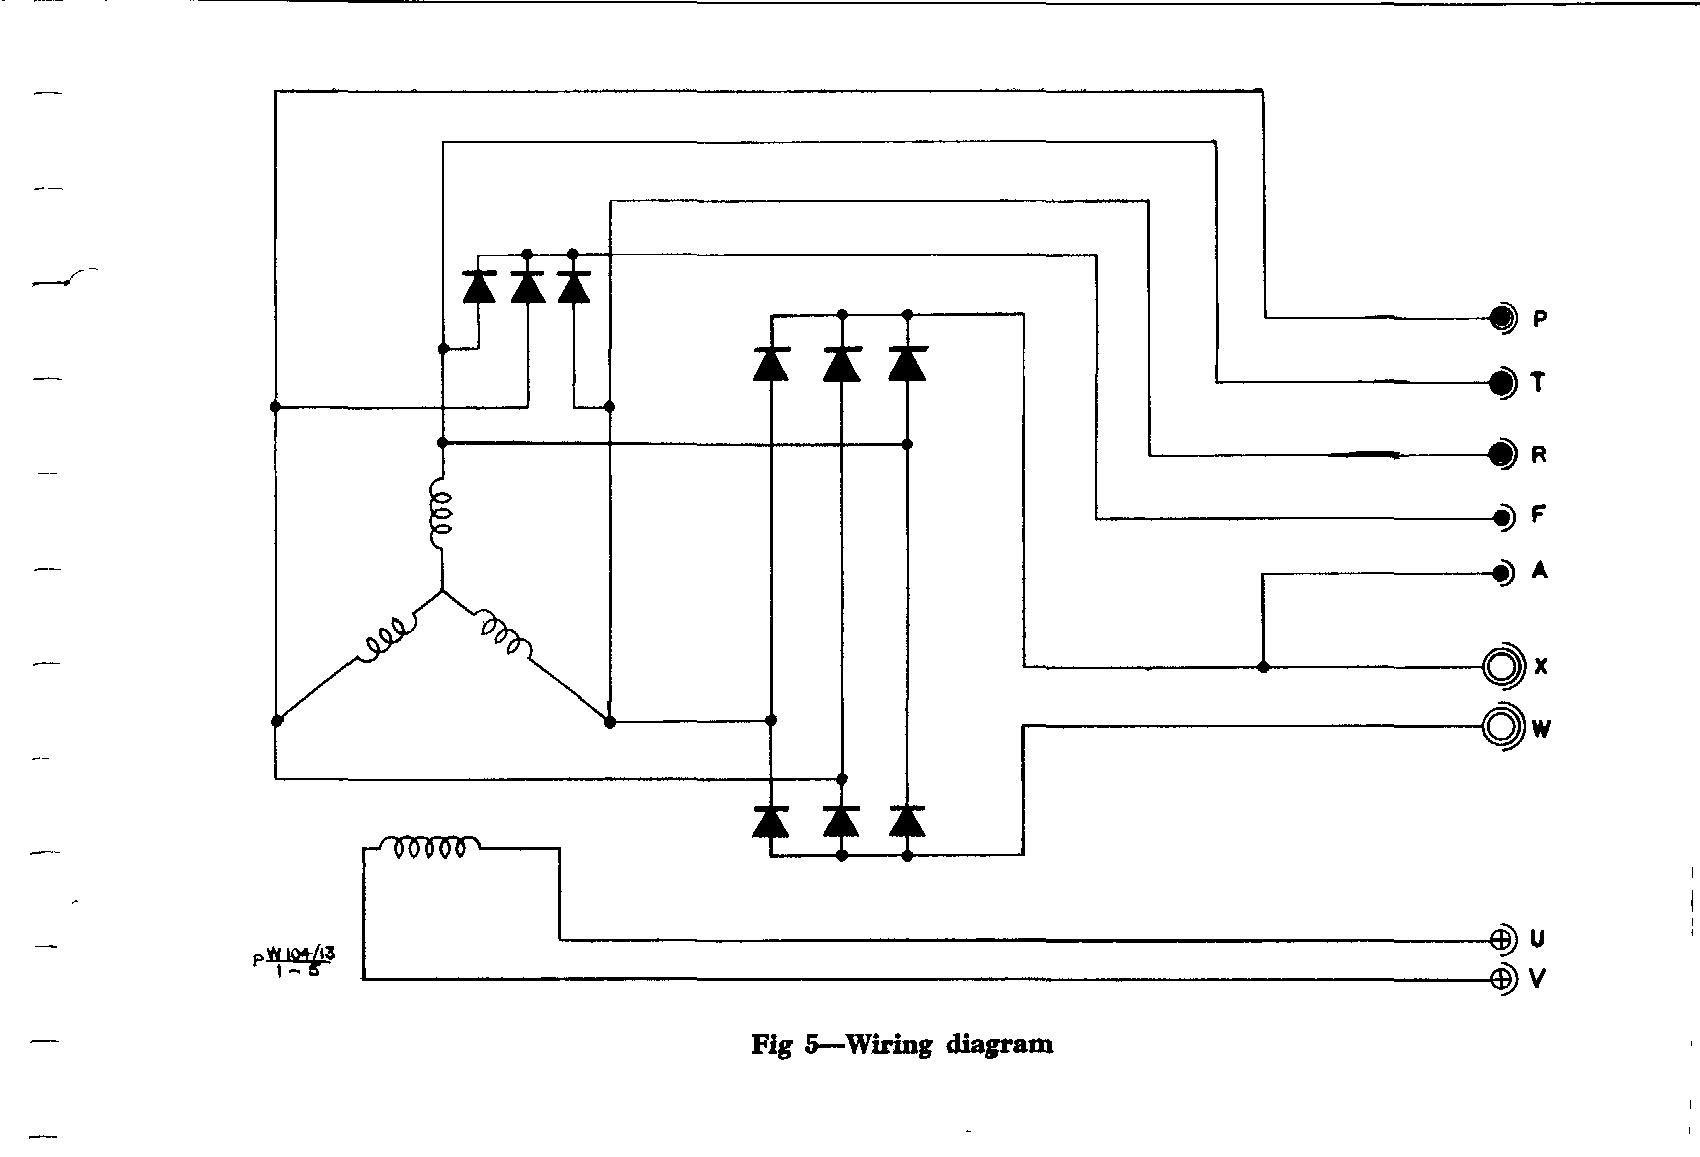 [WLLP_2054]   Alternator Wiring Diagram W Terminal Inspiration Land Rovers ... | Diagram,  Inspiration, Cool photos | Alternator Wiring Diagram W Terminal |  | Pinterest